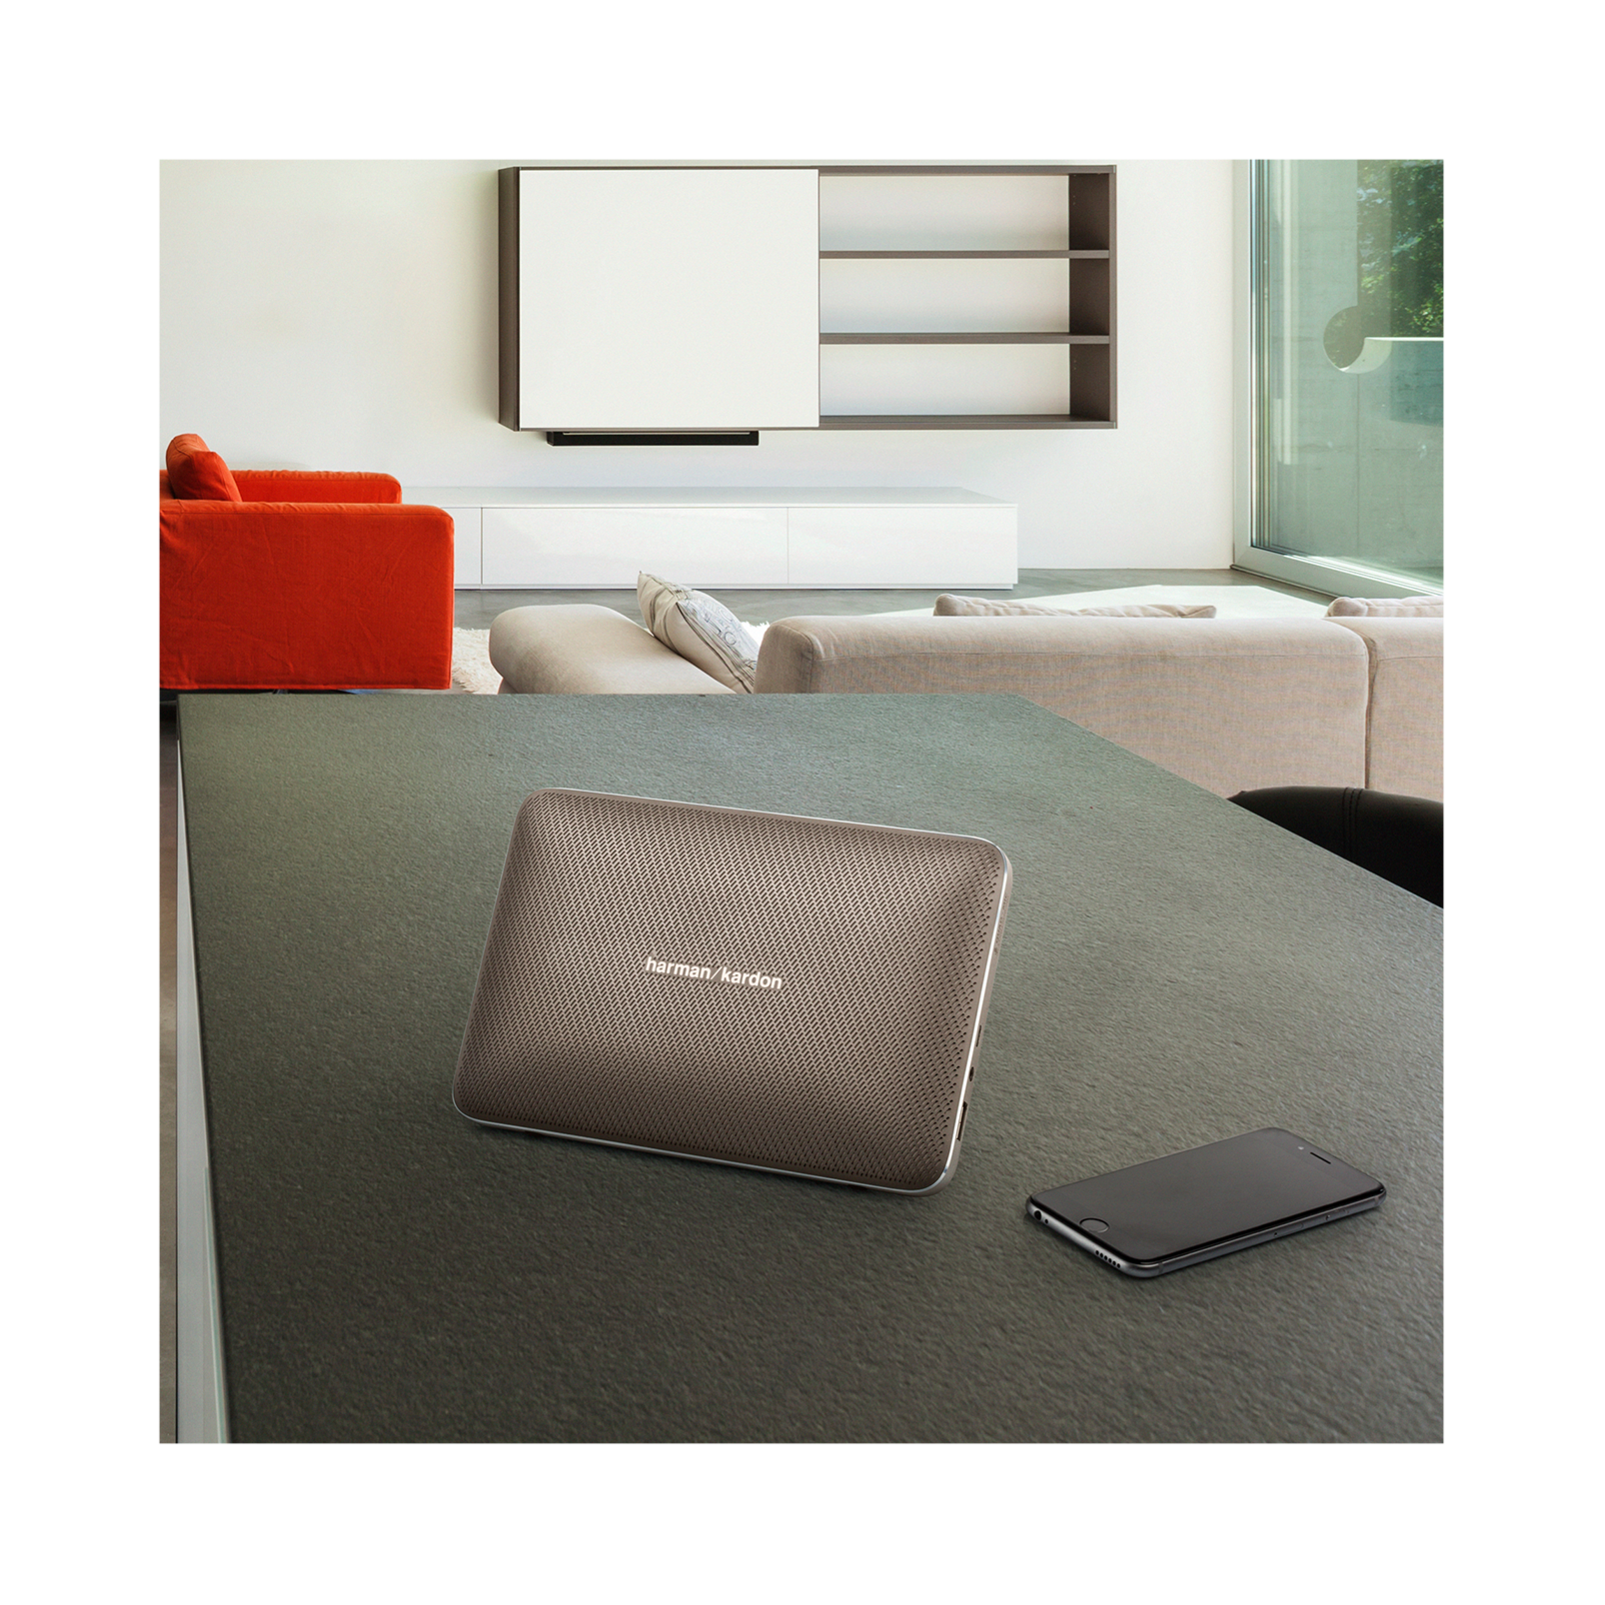 Esquire 2 - Black - Premium portable Bluetooth speaker with quad microphone conferencing system - Detailshot 7